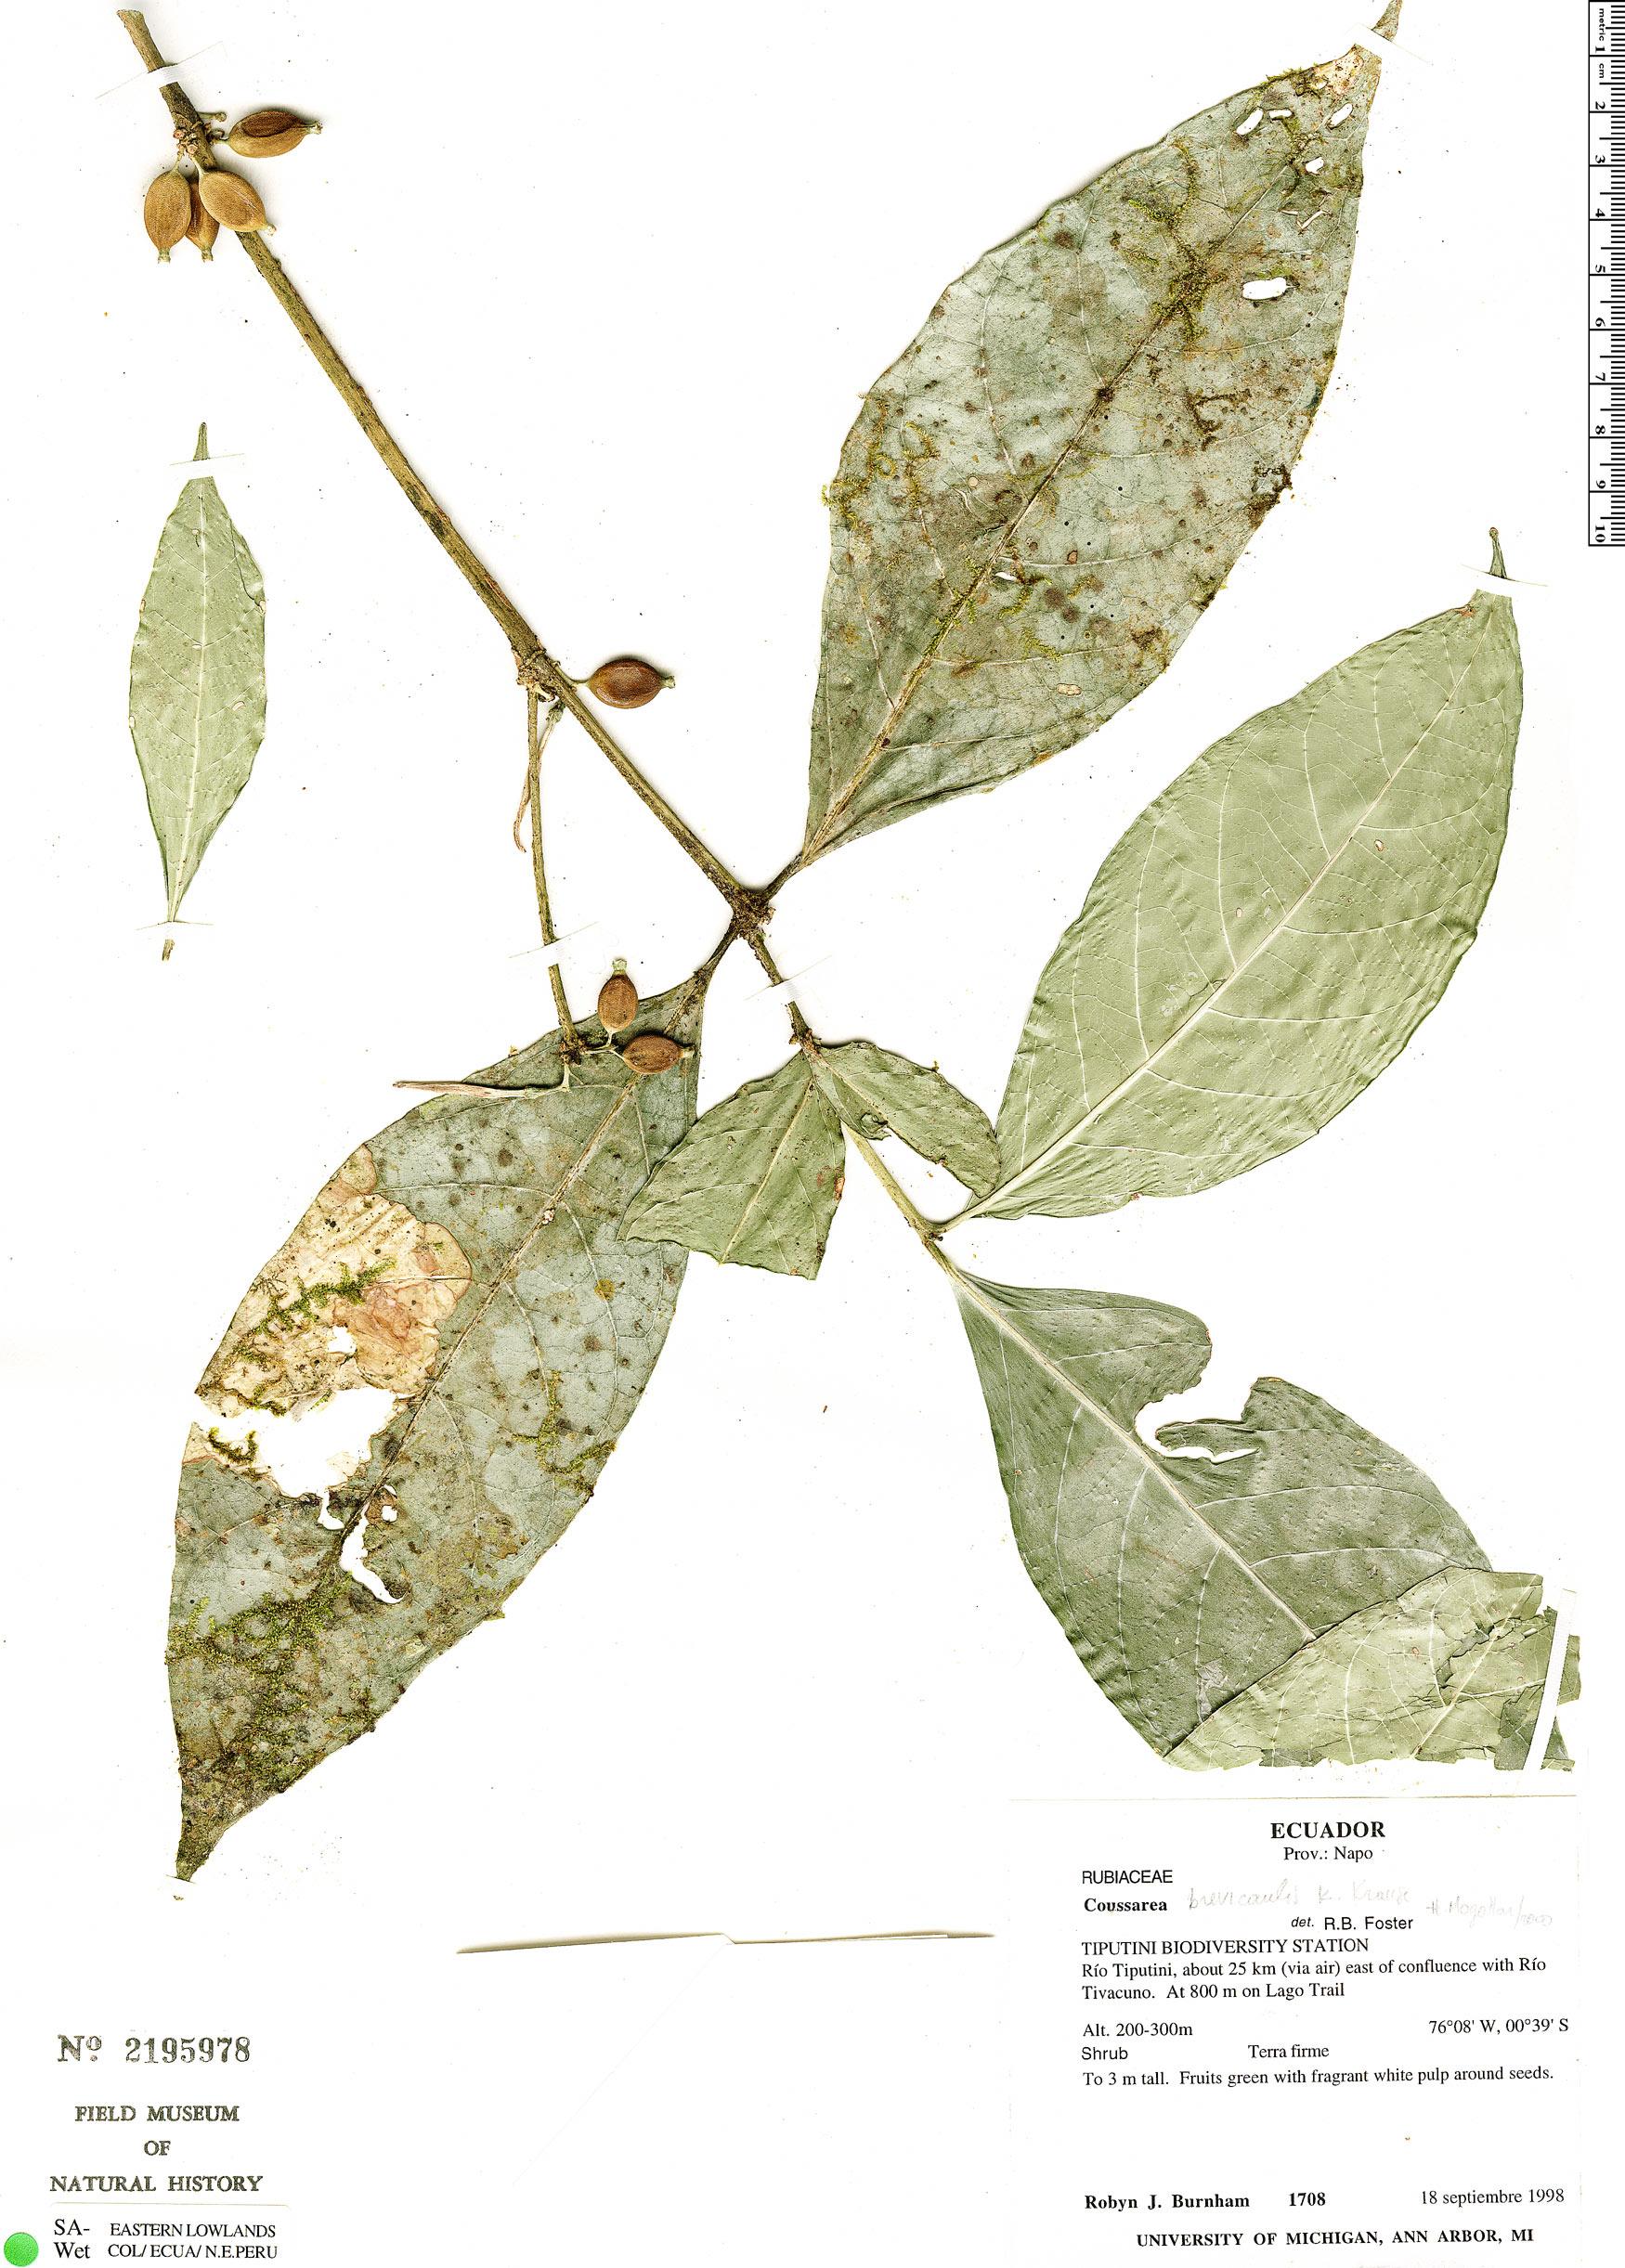 Specimen: Coussarea brevicaulis